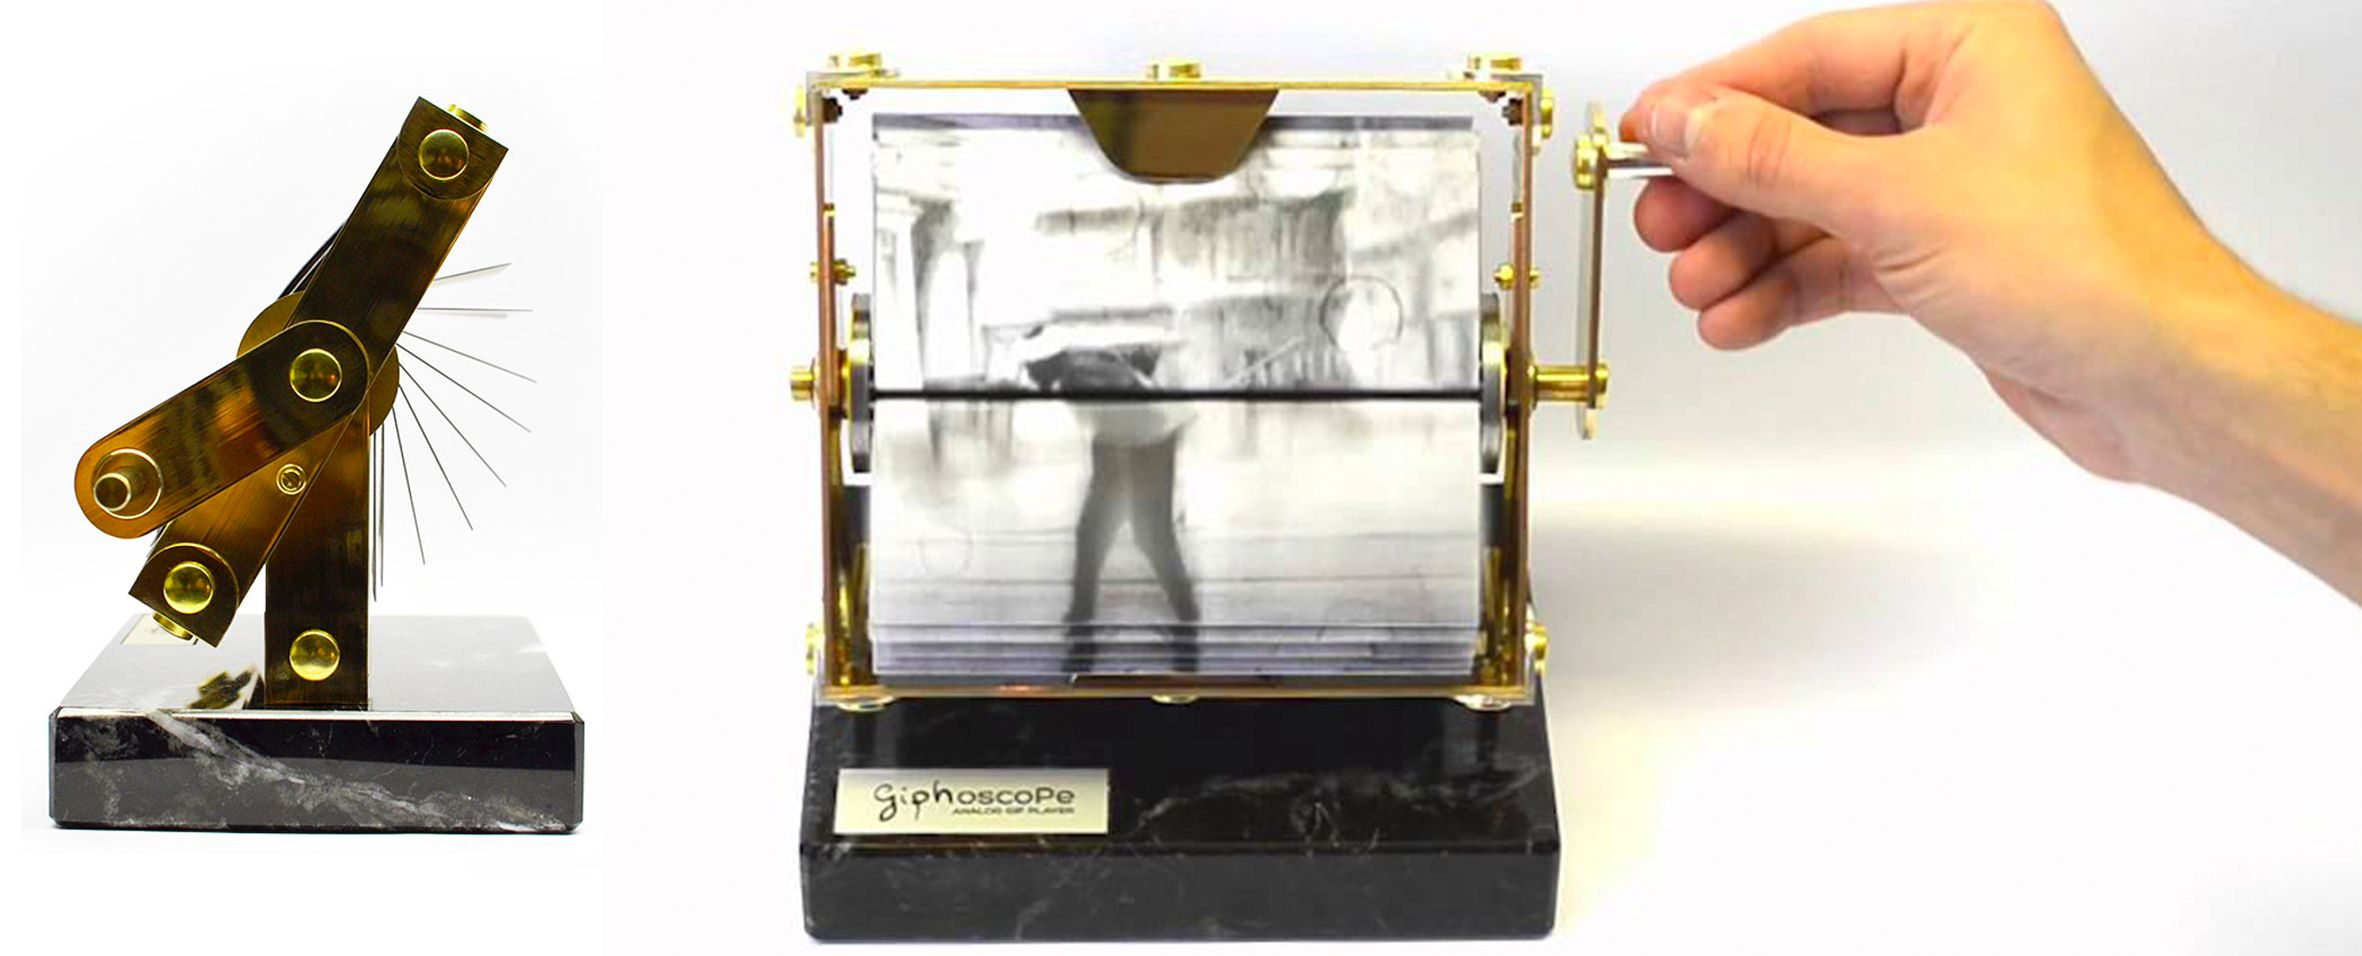 Giphoscope, l'intrigante gif player analogico